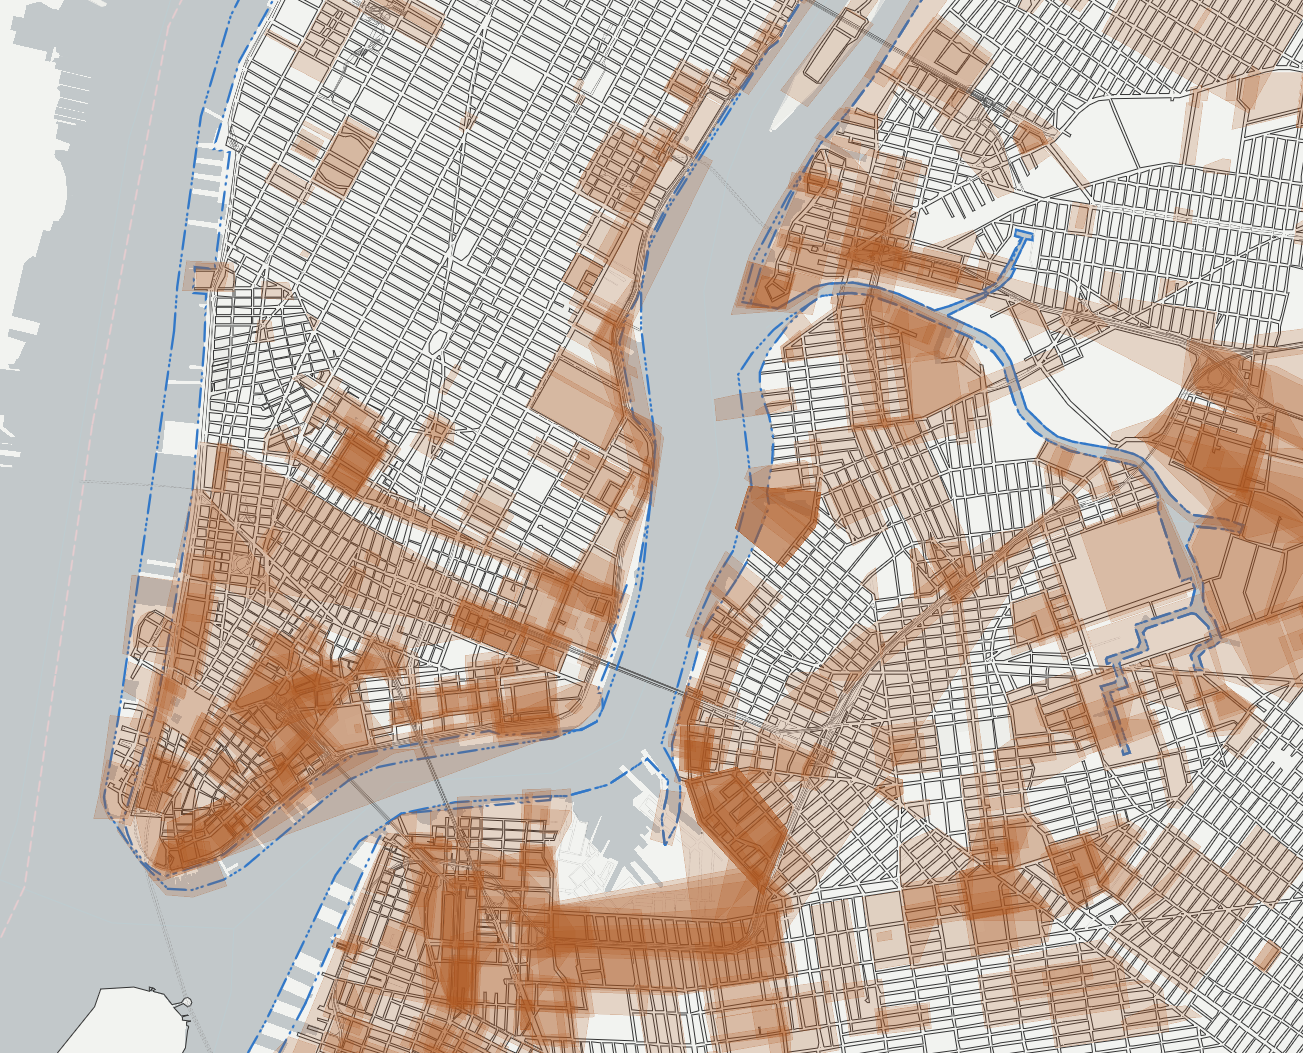 Midtown-New York City Streets Map - street location maps ...  New York City Grid Map